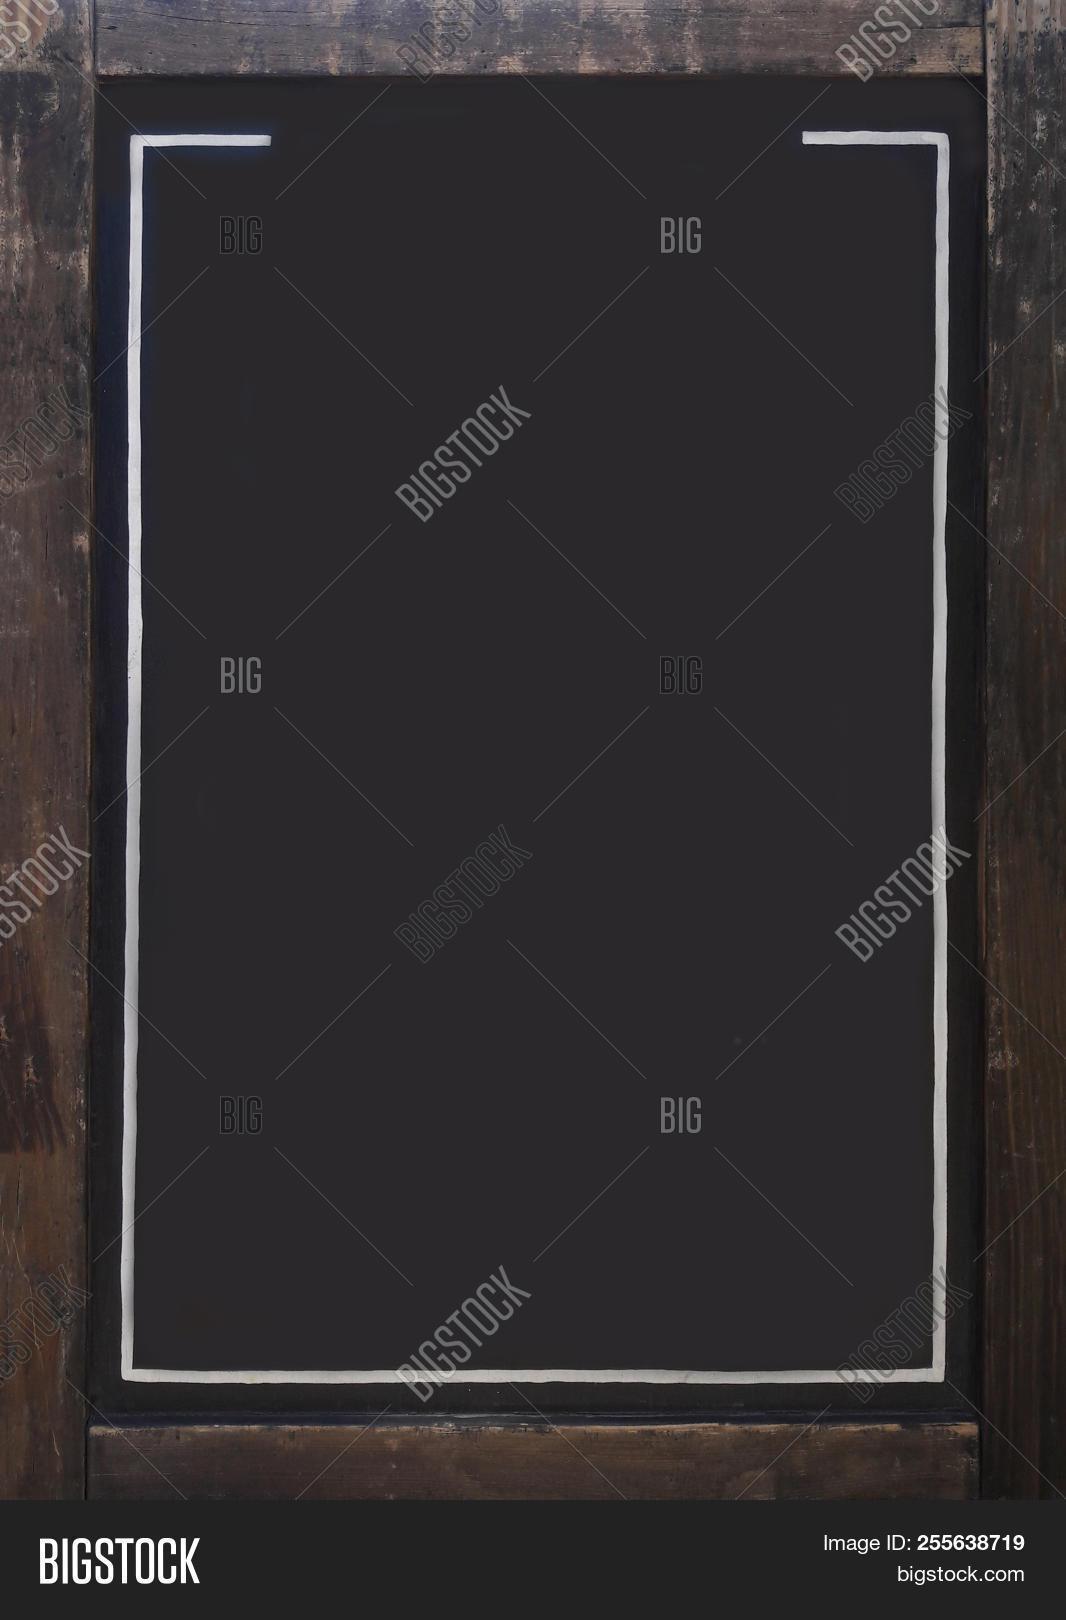 Design Of The Menu On The Black Board. The Menu Template. The Background Of The Menu On The Black Bo